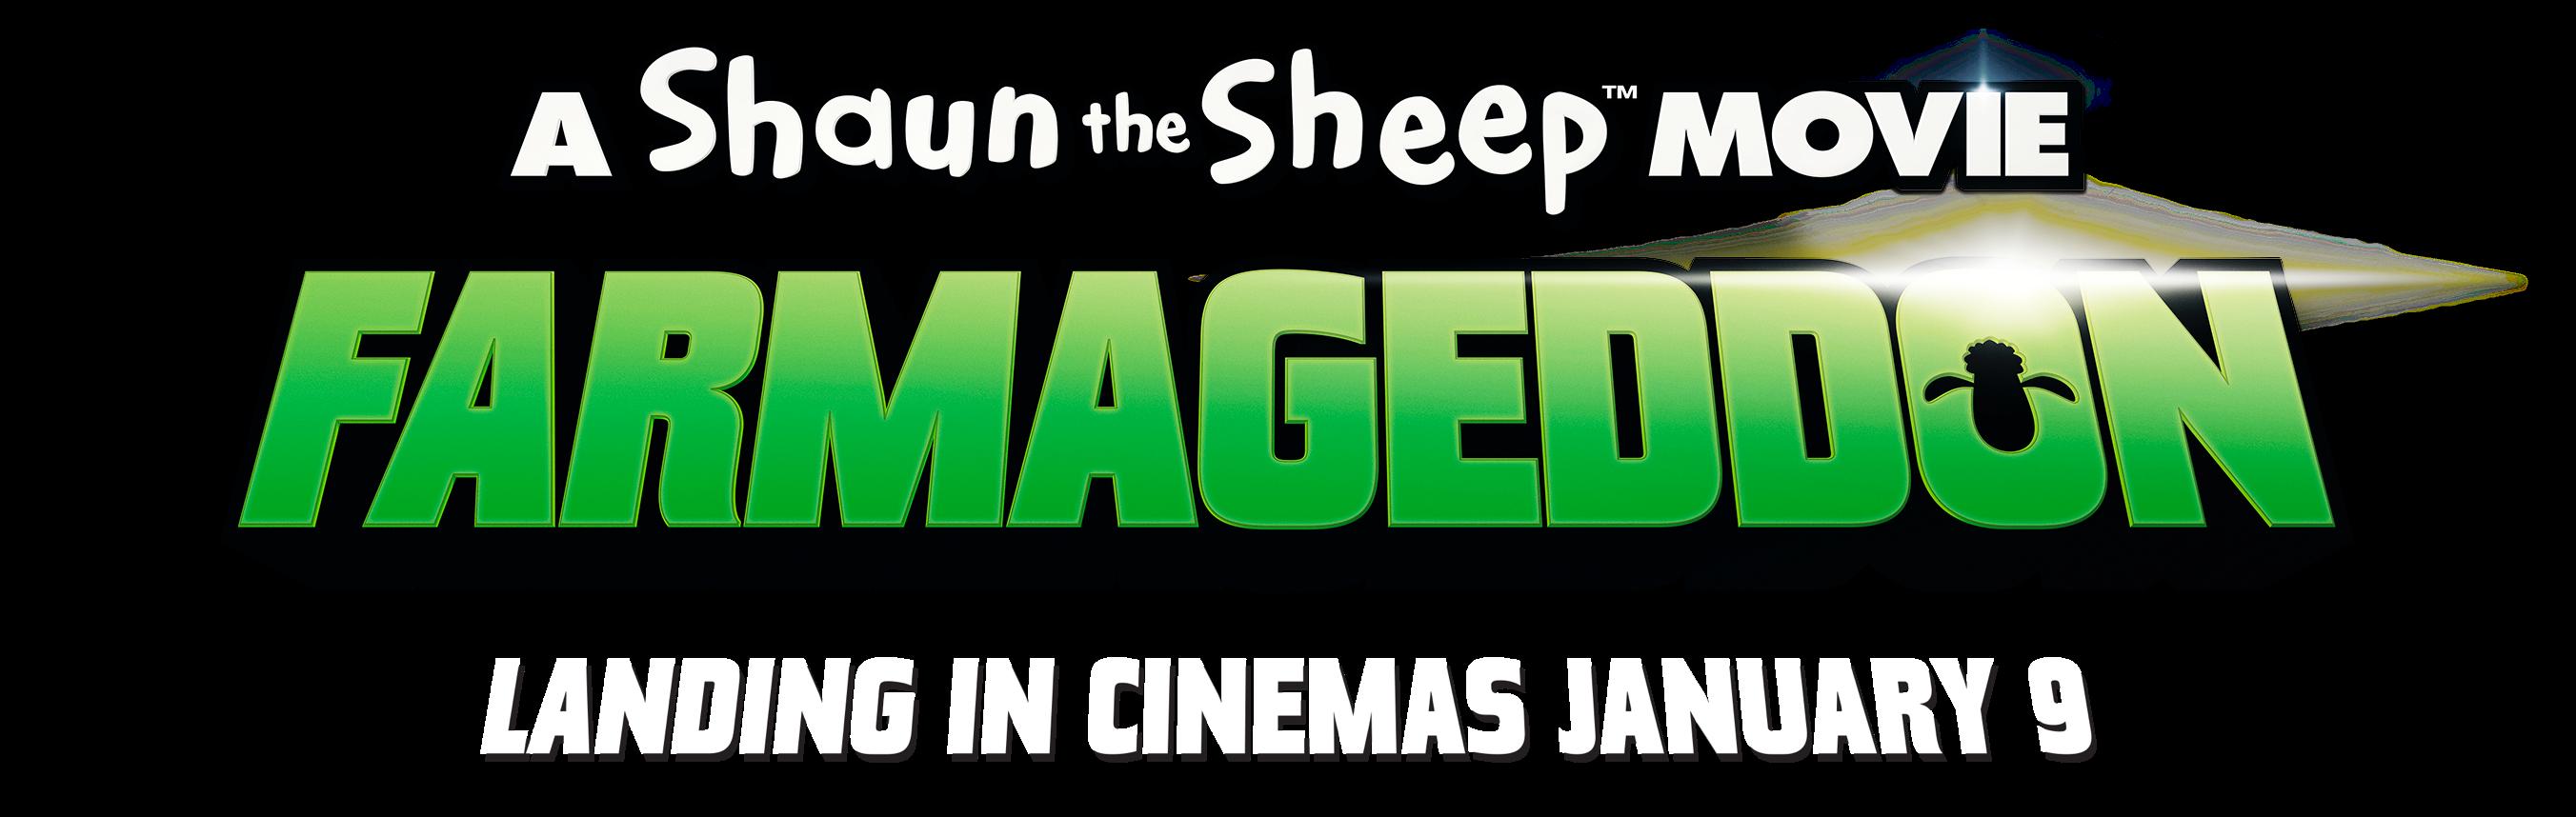 A Shaun the Sheep Movie: Farmageddon : %$SYNOPSIS% | STUDIOCANAL Intl